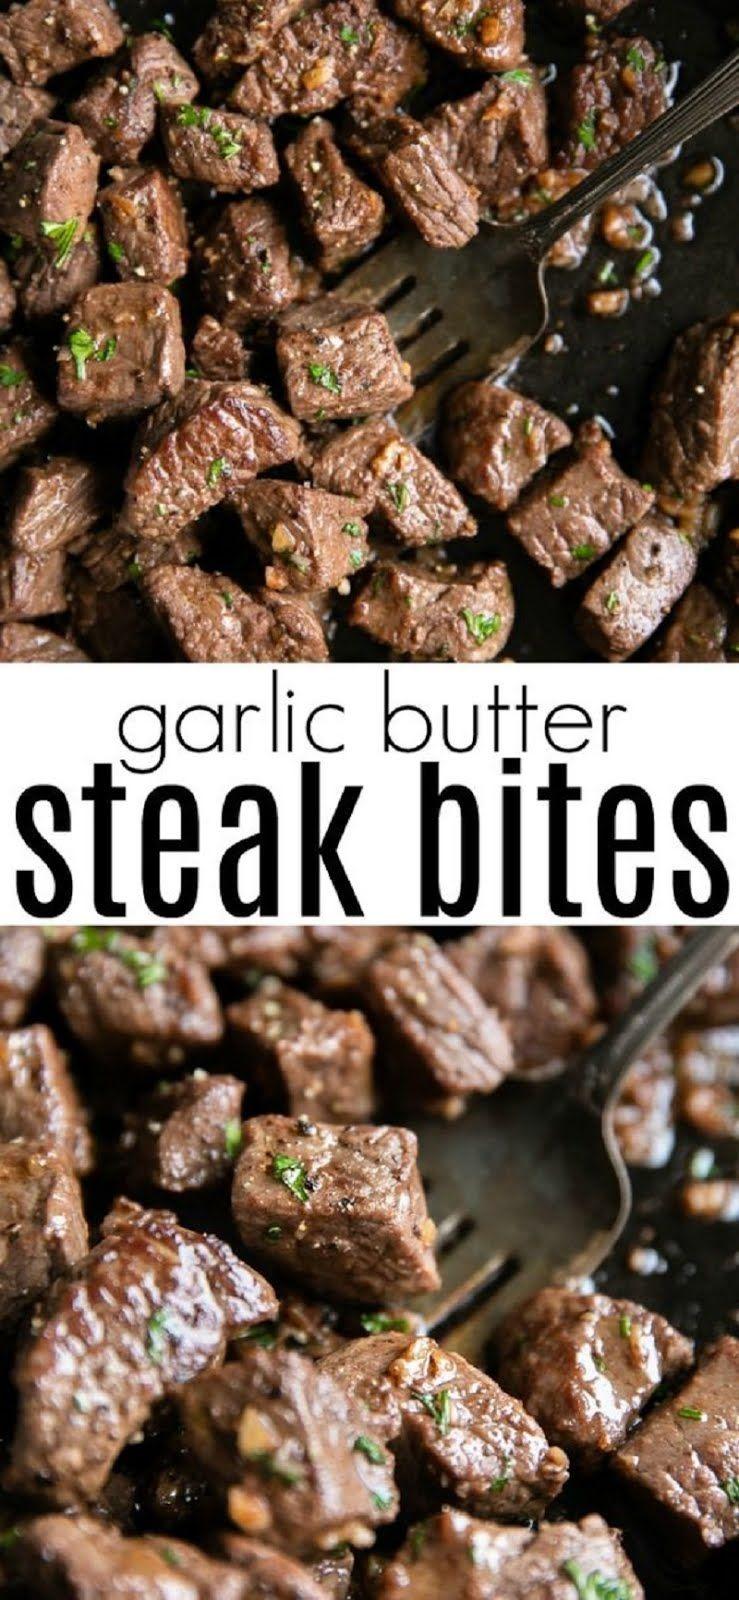 Garlic Butter Steak Bites Recipe images